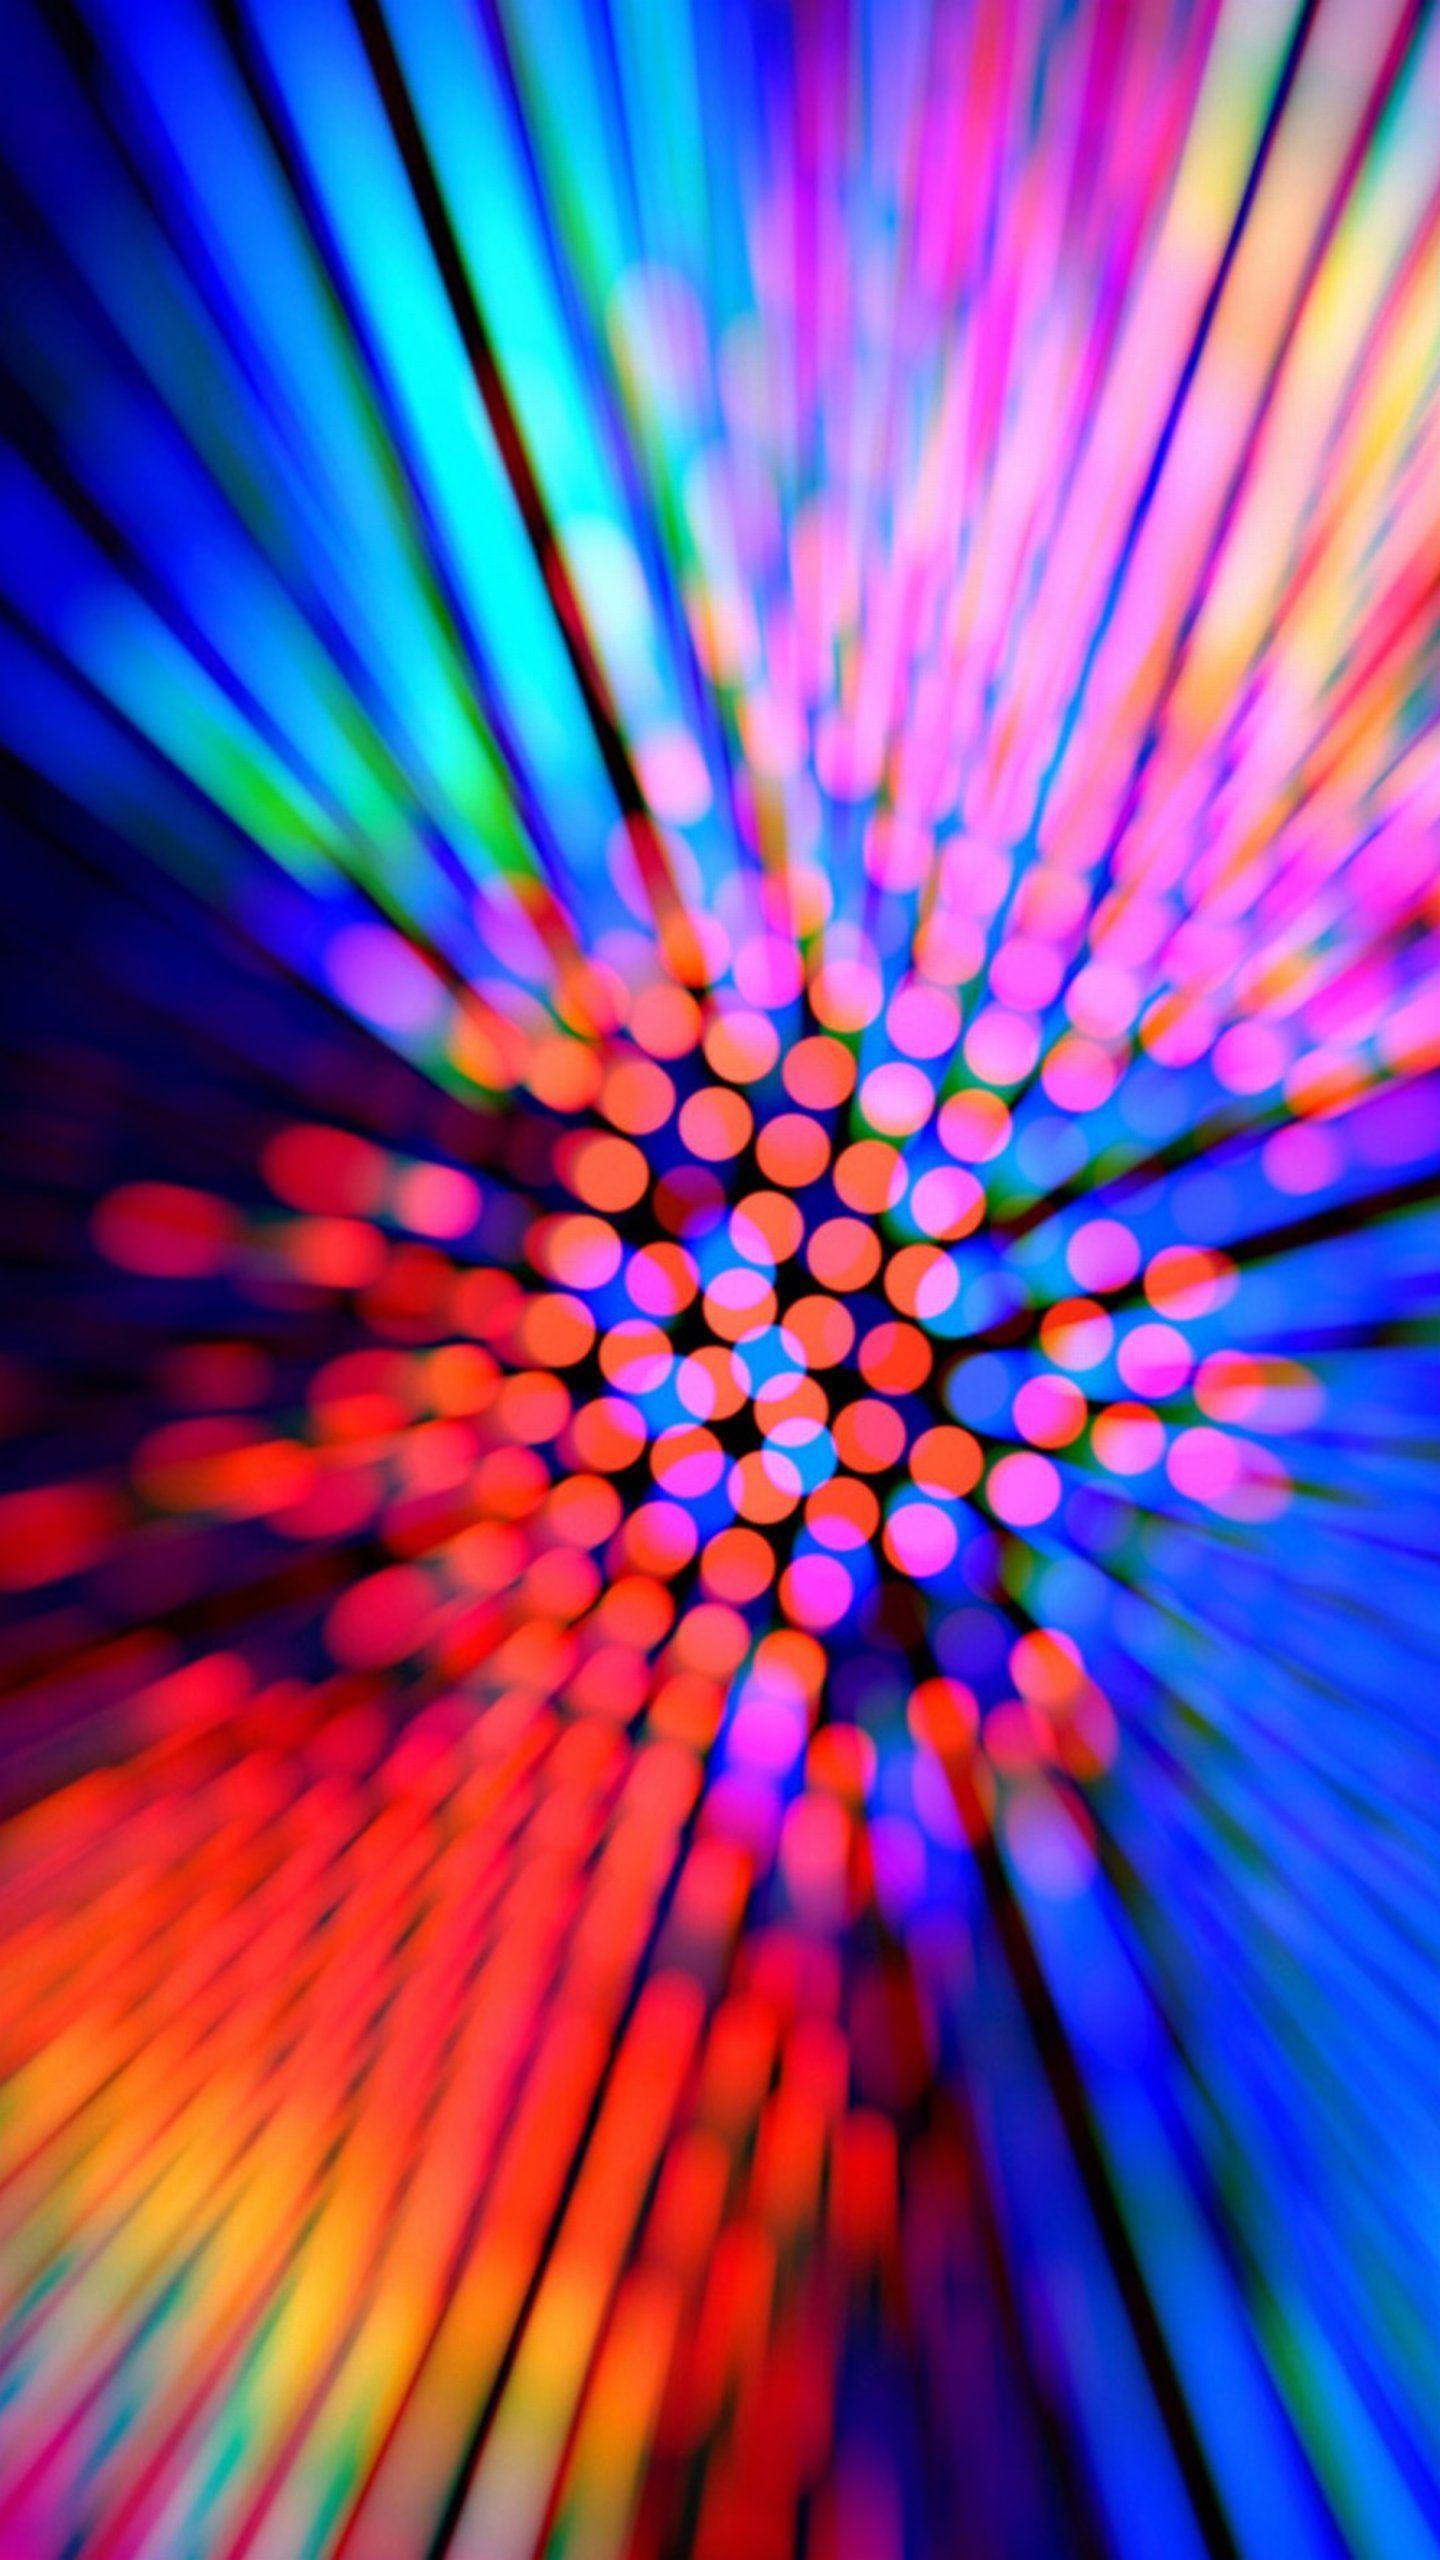 Wallpapers Lg G4 Szukaj W Google LG G4 Wallpapers Pinterest